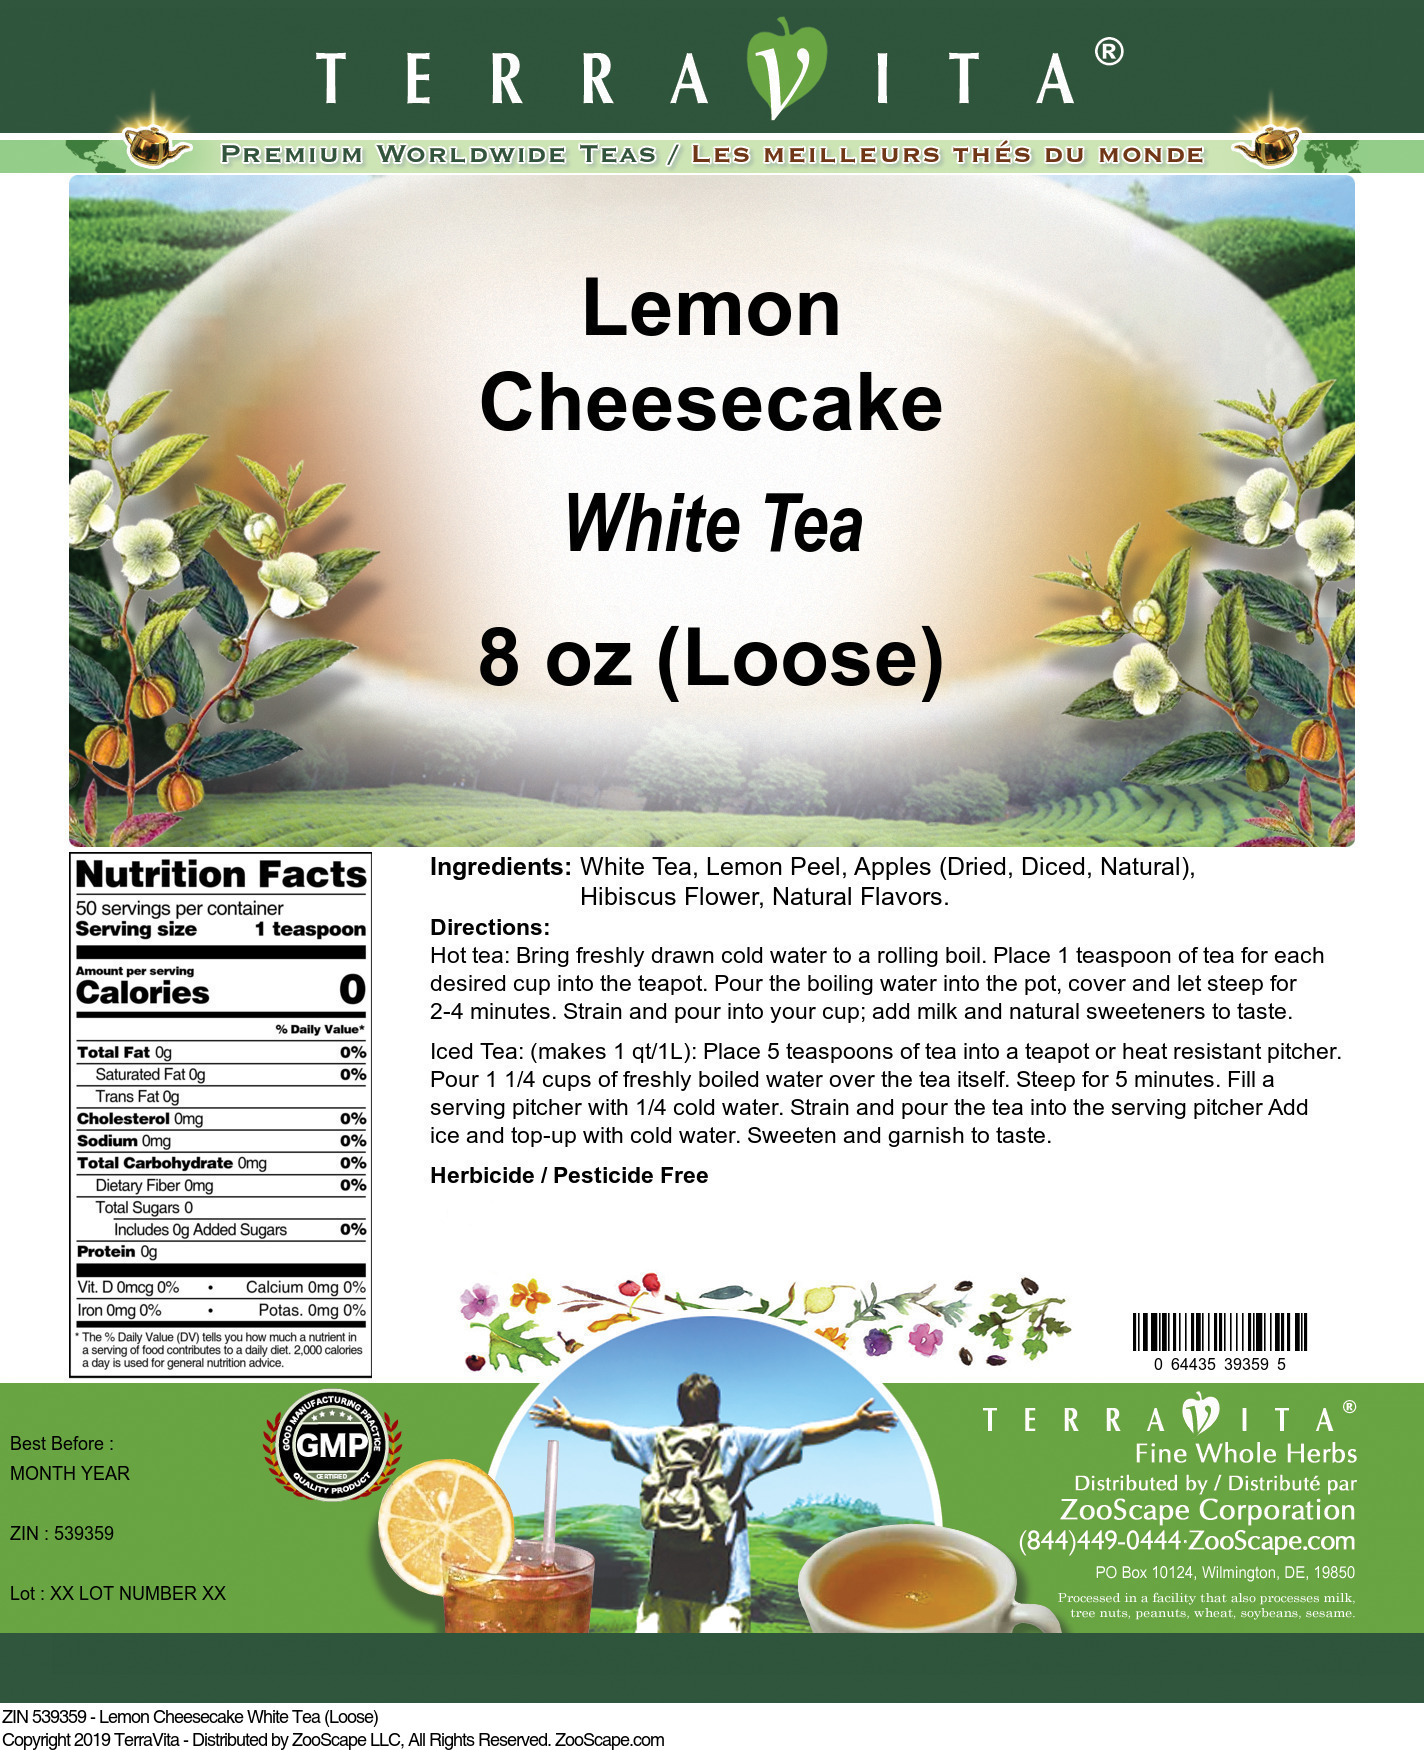 Lemon Cheesecake White Tea (Loose)